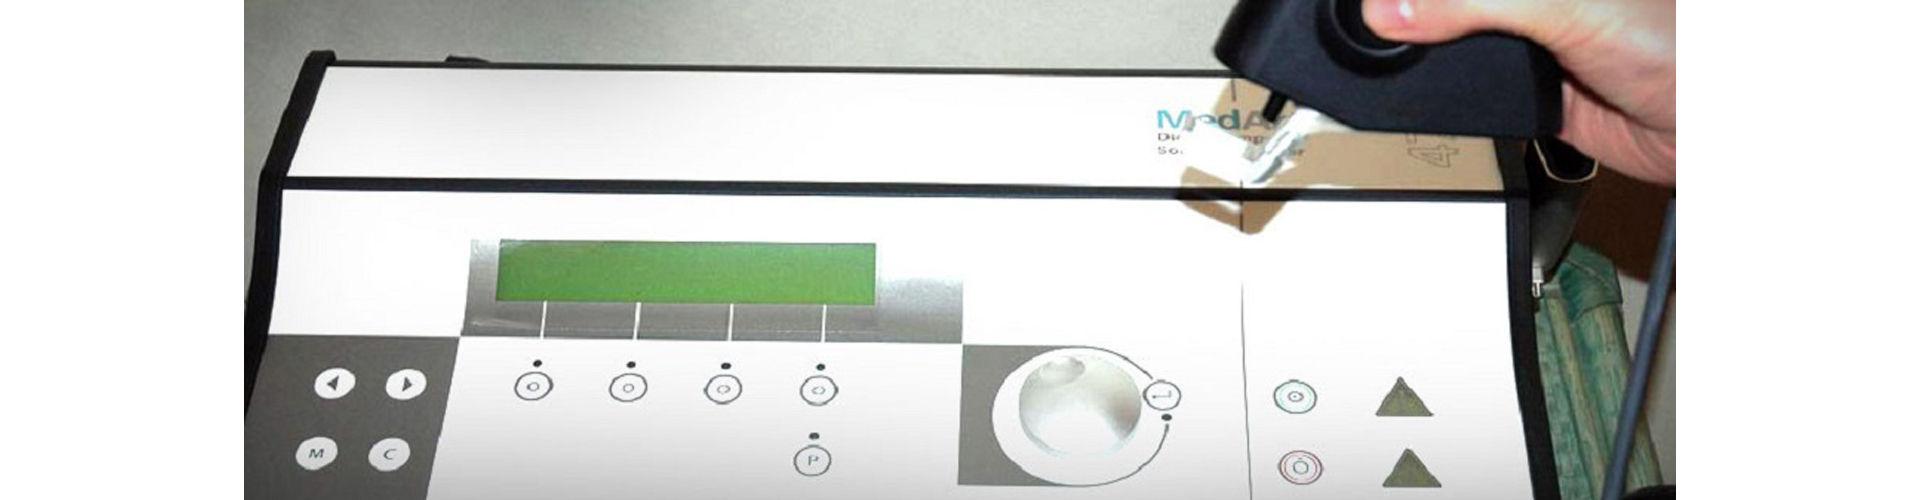 Wynajem laser Medart 470